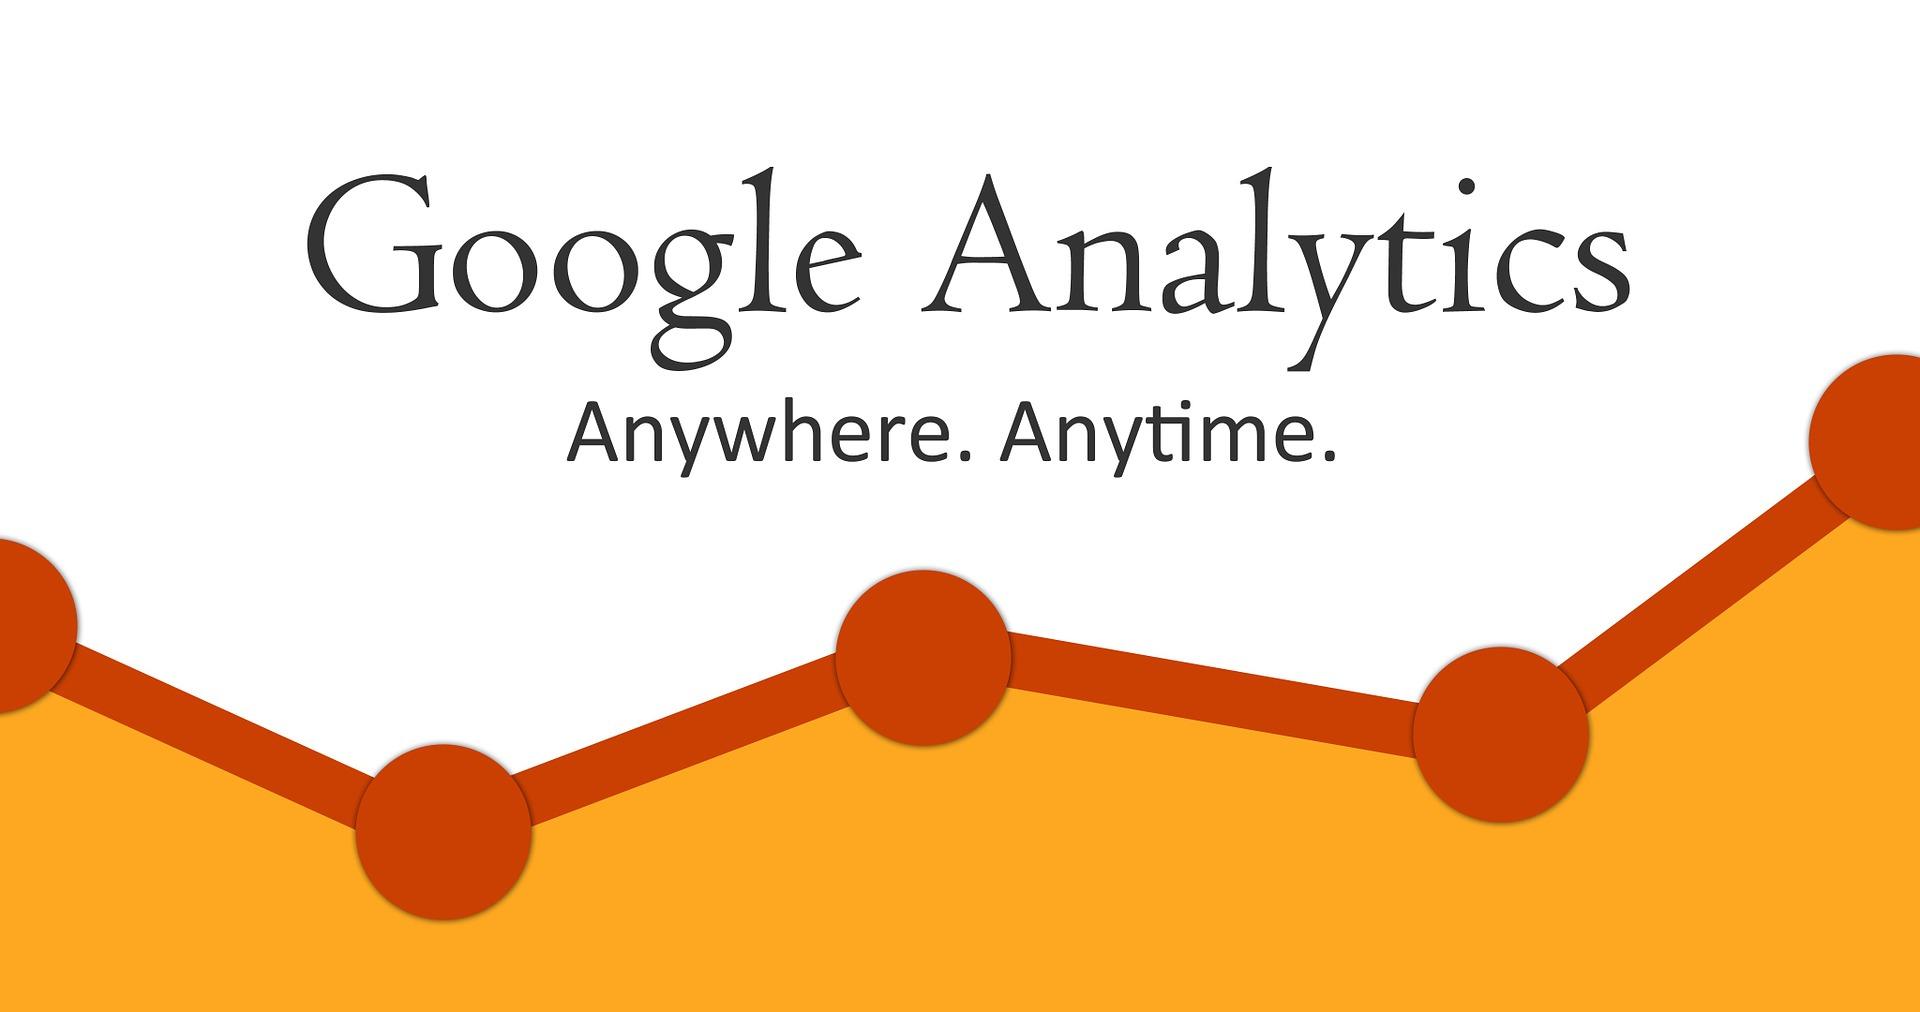 google anlaytics logo